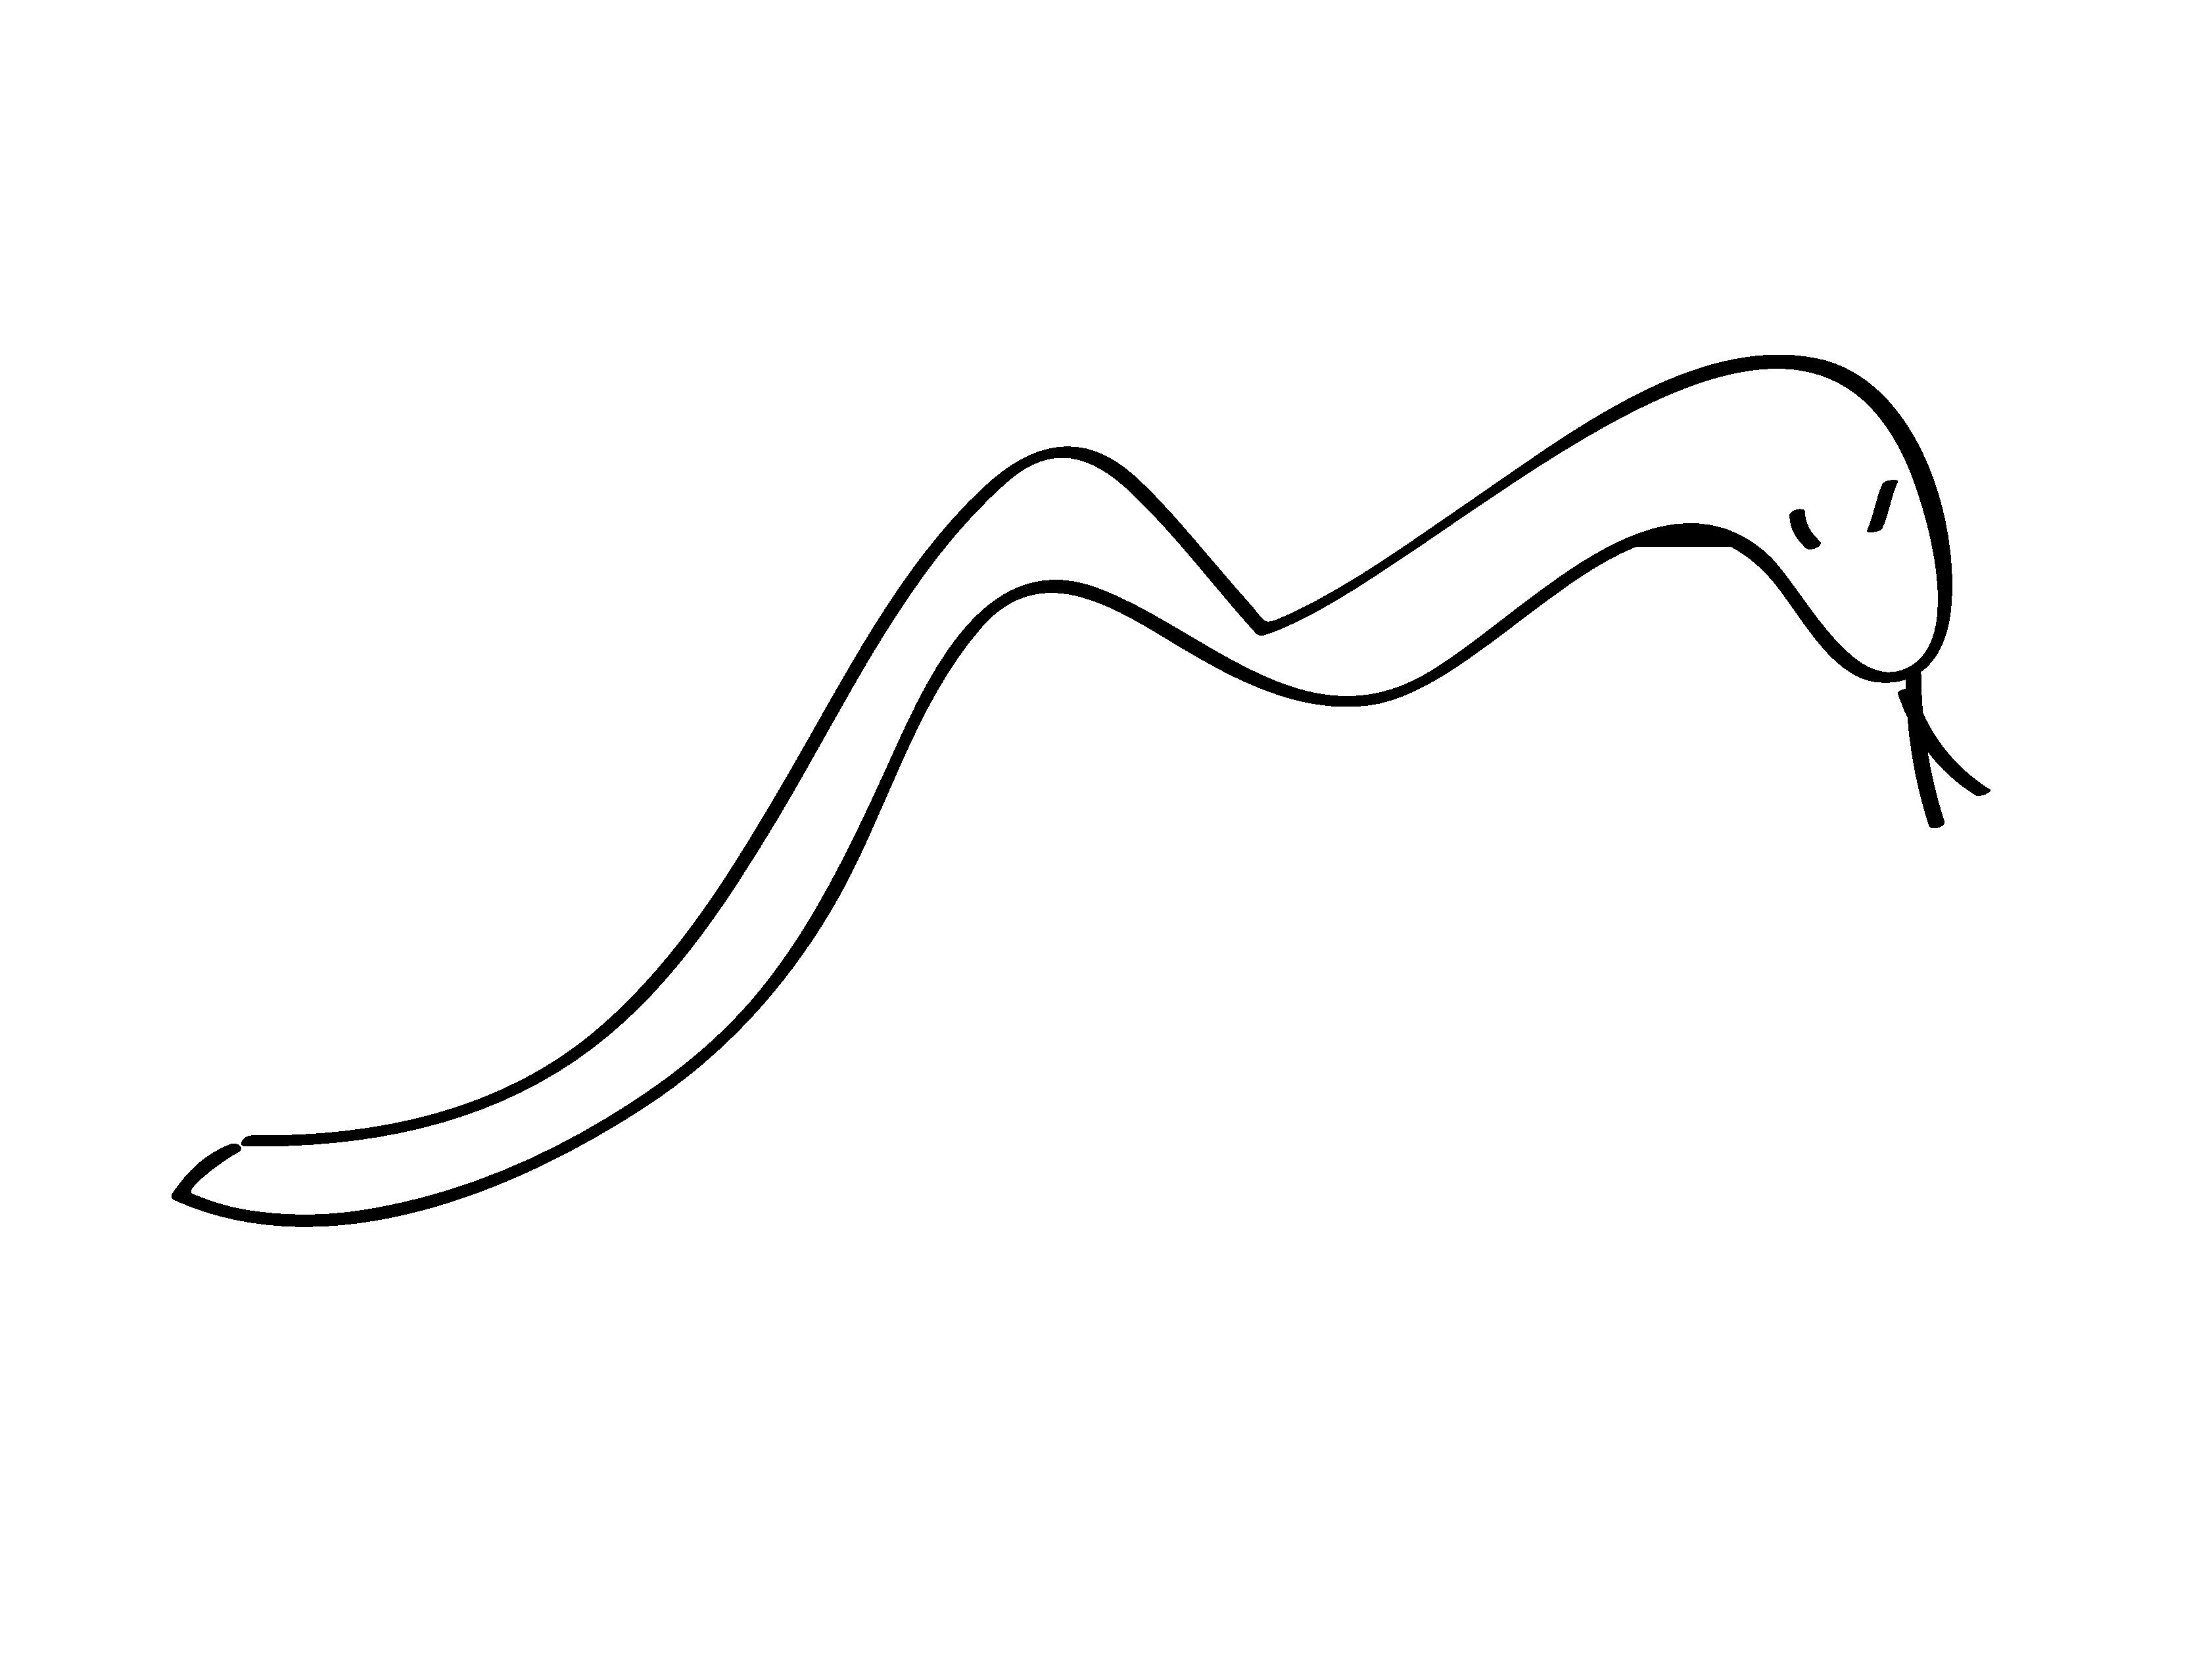 Long snake and short snake clipart black and white clip art transparent library Snake black and white snake clipart black and white line art ... clip art transparent library